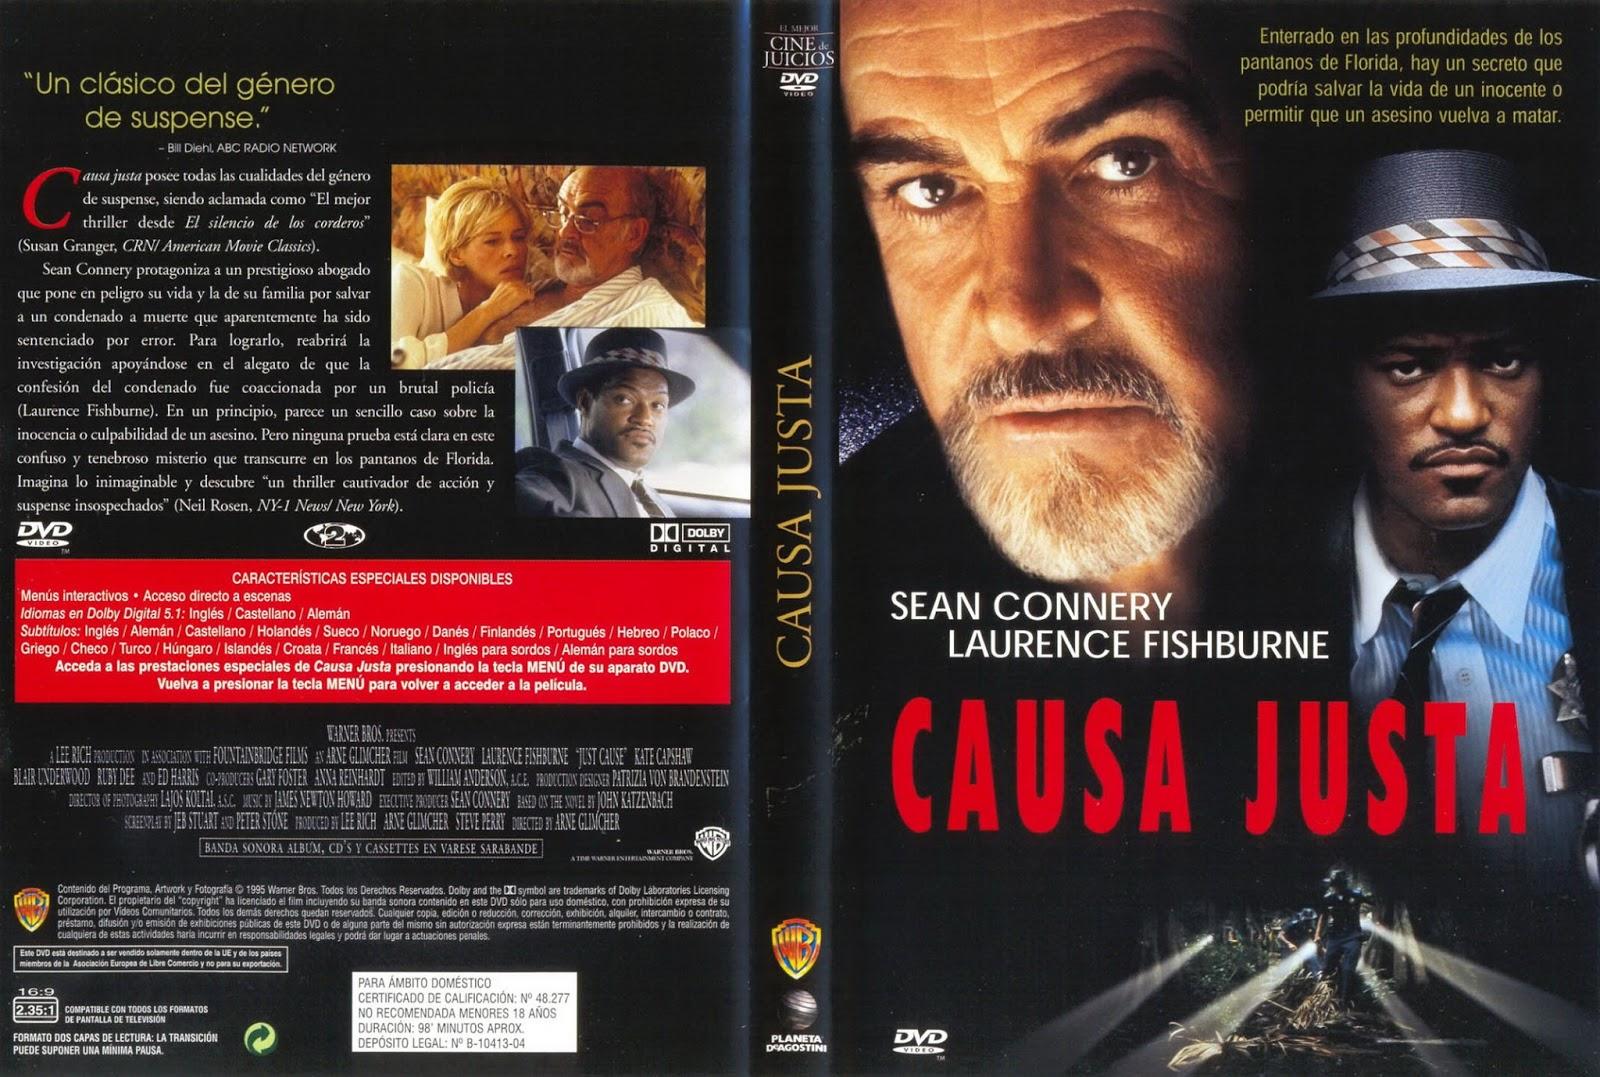 MI ENCICLOPEDIA DE CINE: 1995 - Causa Justa - Just cause Carteles1600 x 1077